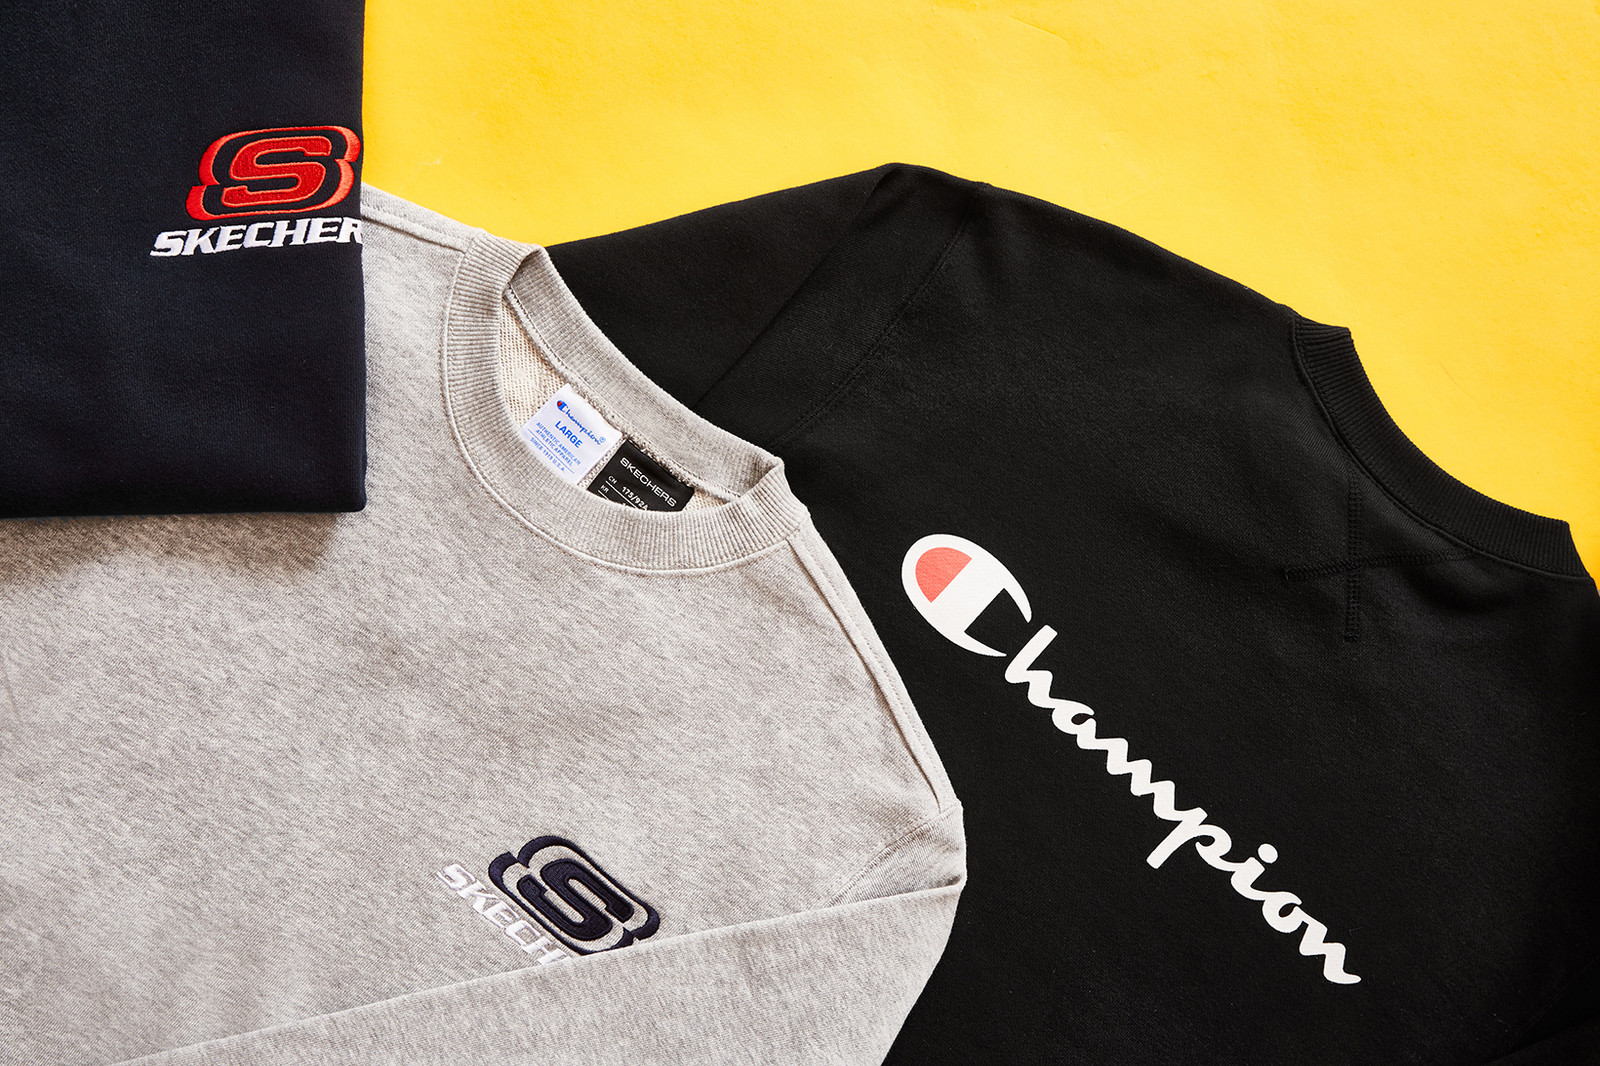 Skechers x Champion Clothing Collaboration 2018 Leisurewear Sportswear Street Style Chunky Sneakers 90s